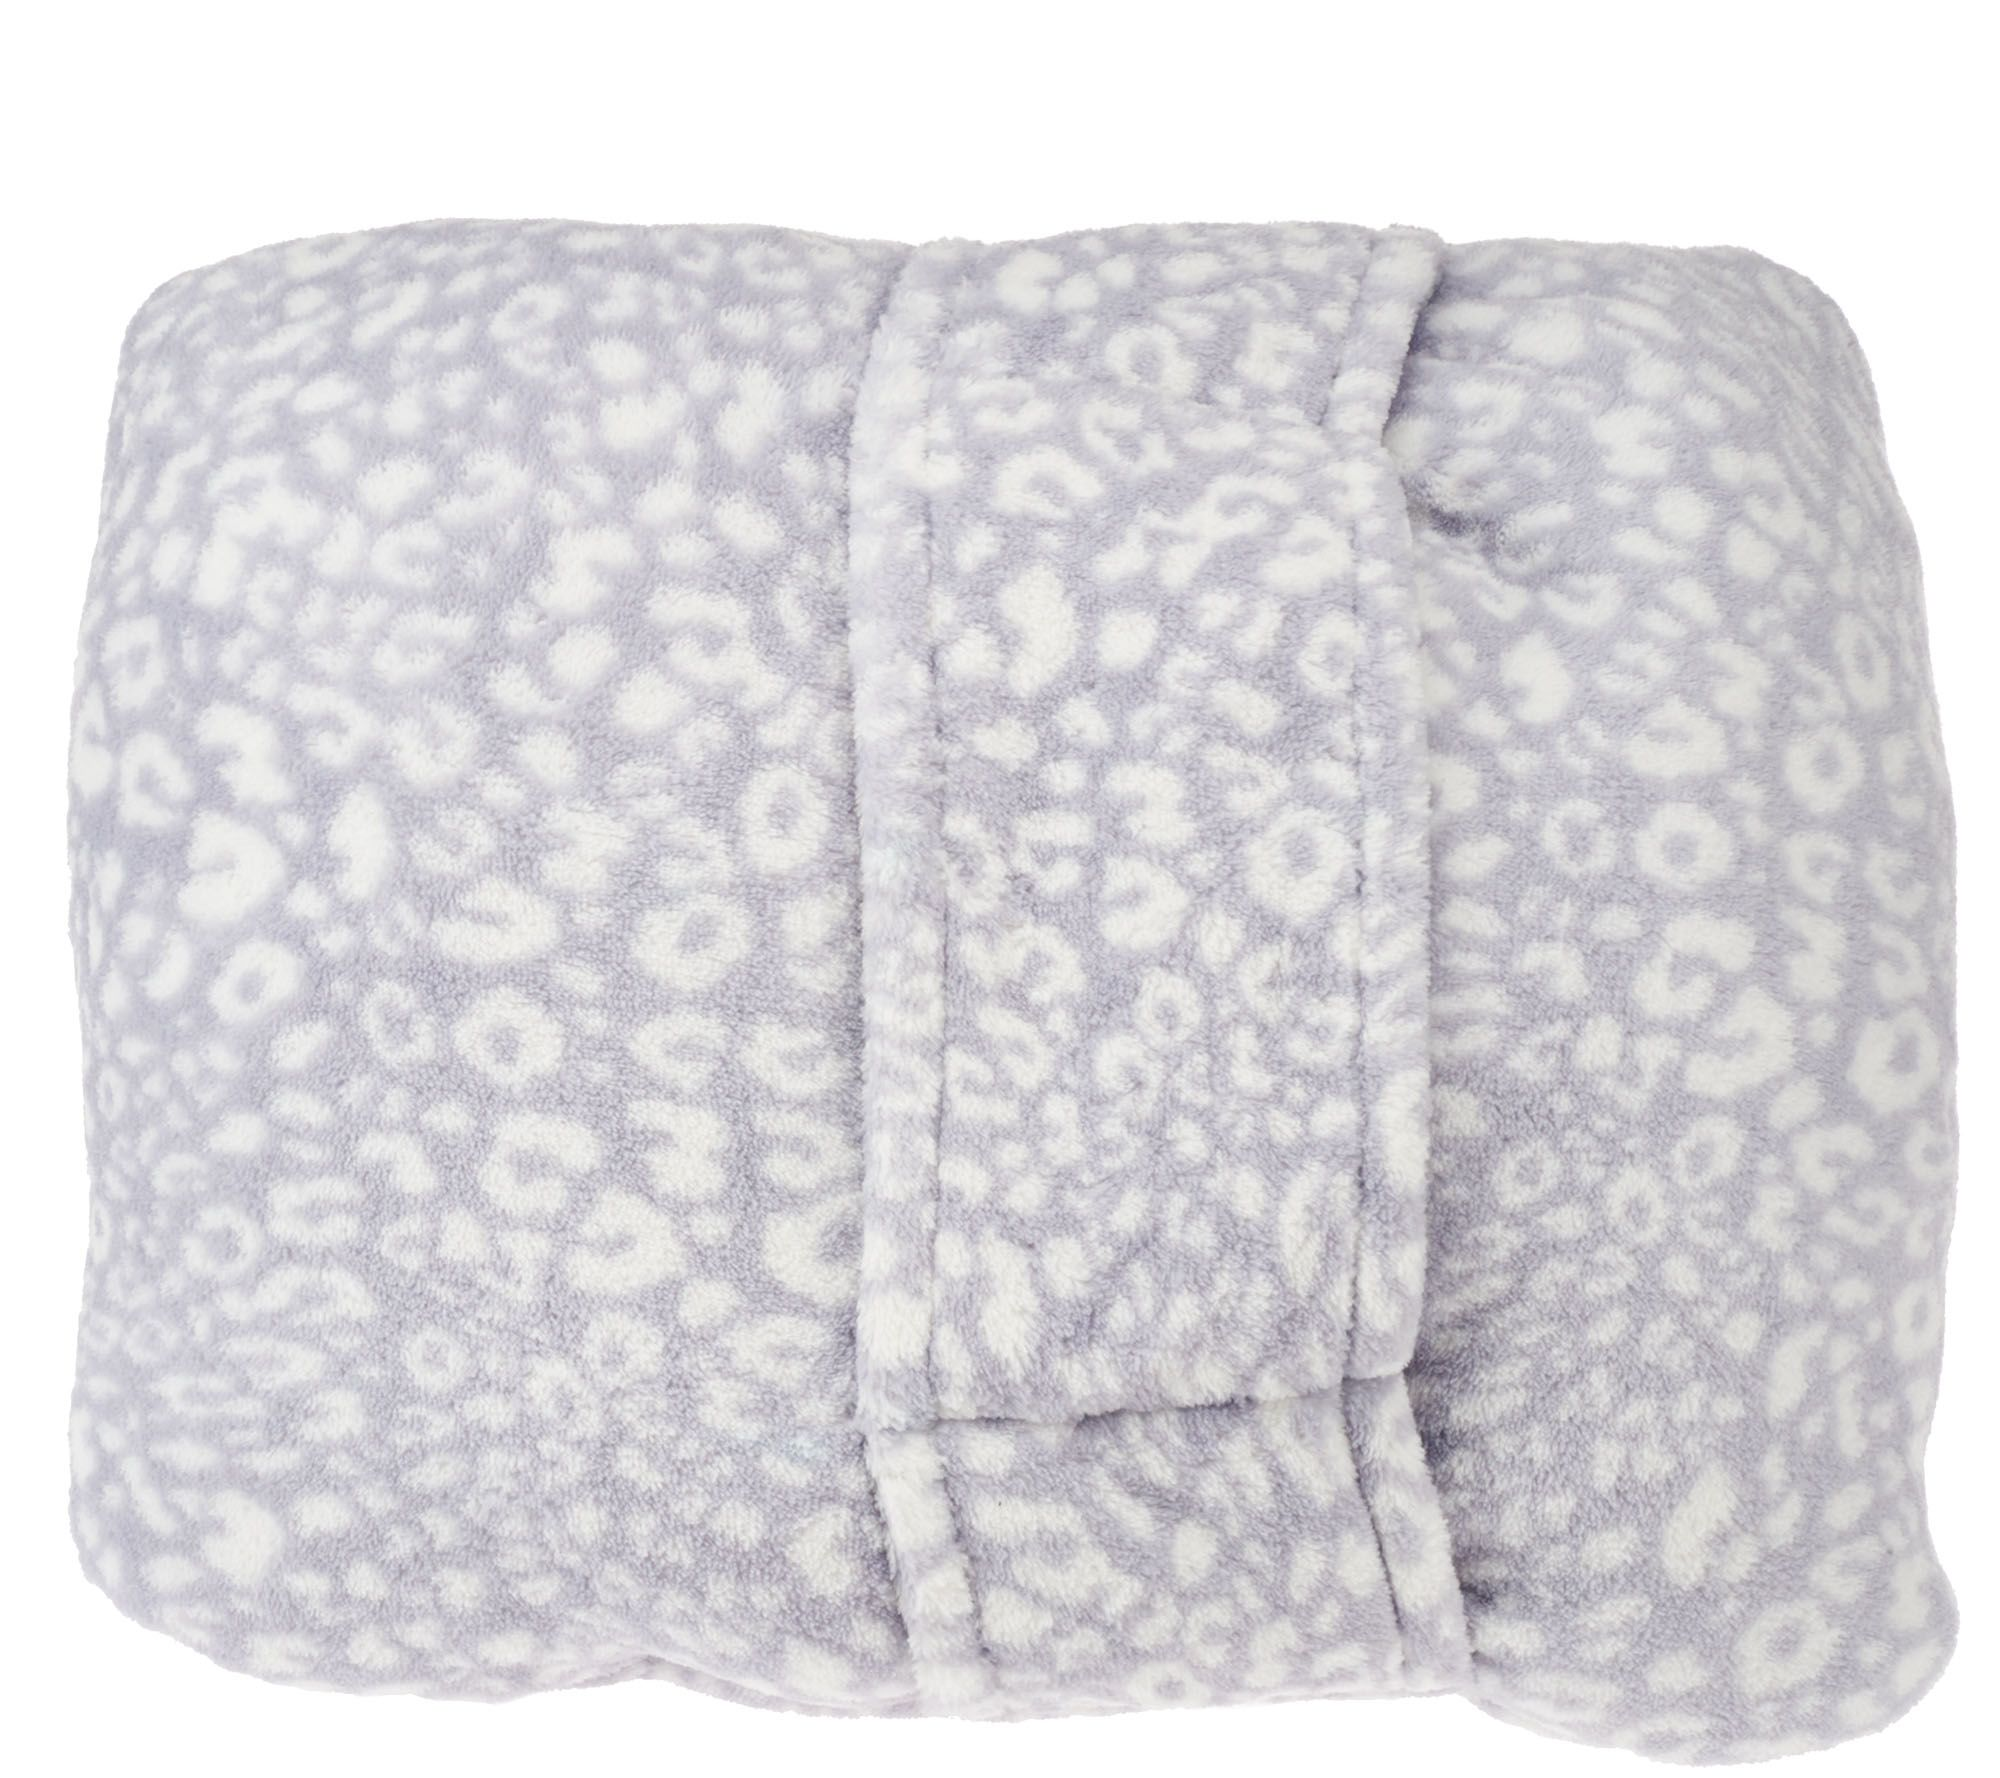 Vera Bradley Fleece Travel Blanket/Pillow - Page 1 ? QVC.com